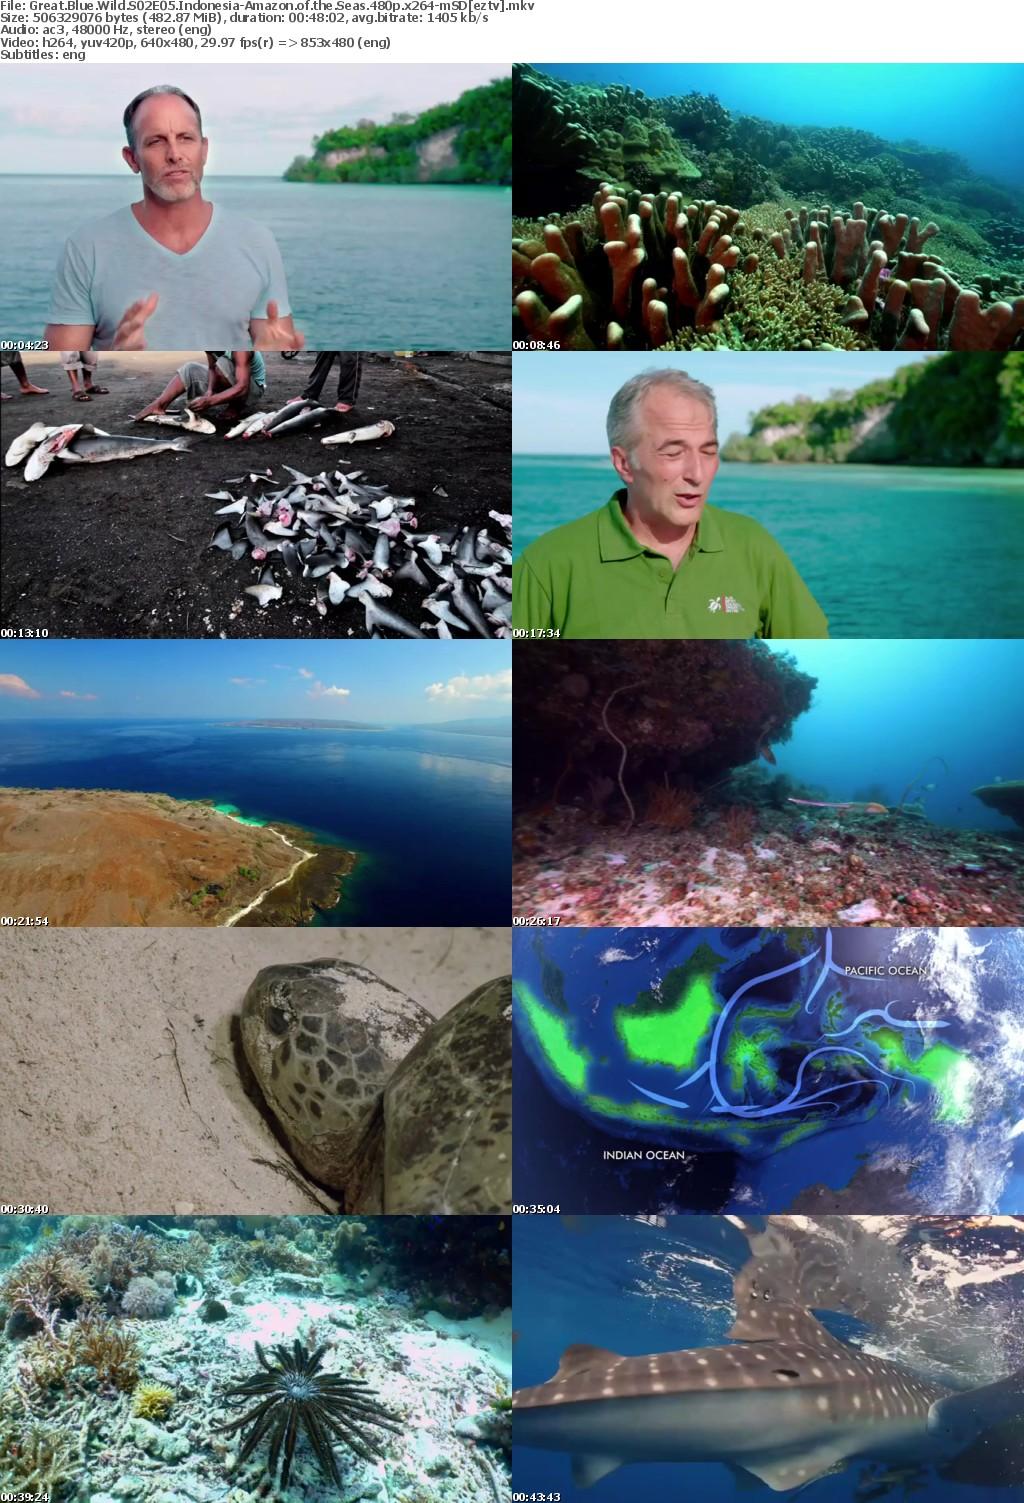 Great Blue Wild S02E05 Indonesia-Amazon of the Seas 480p x264-mSD